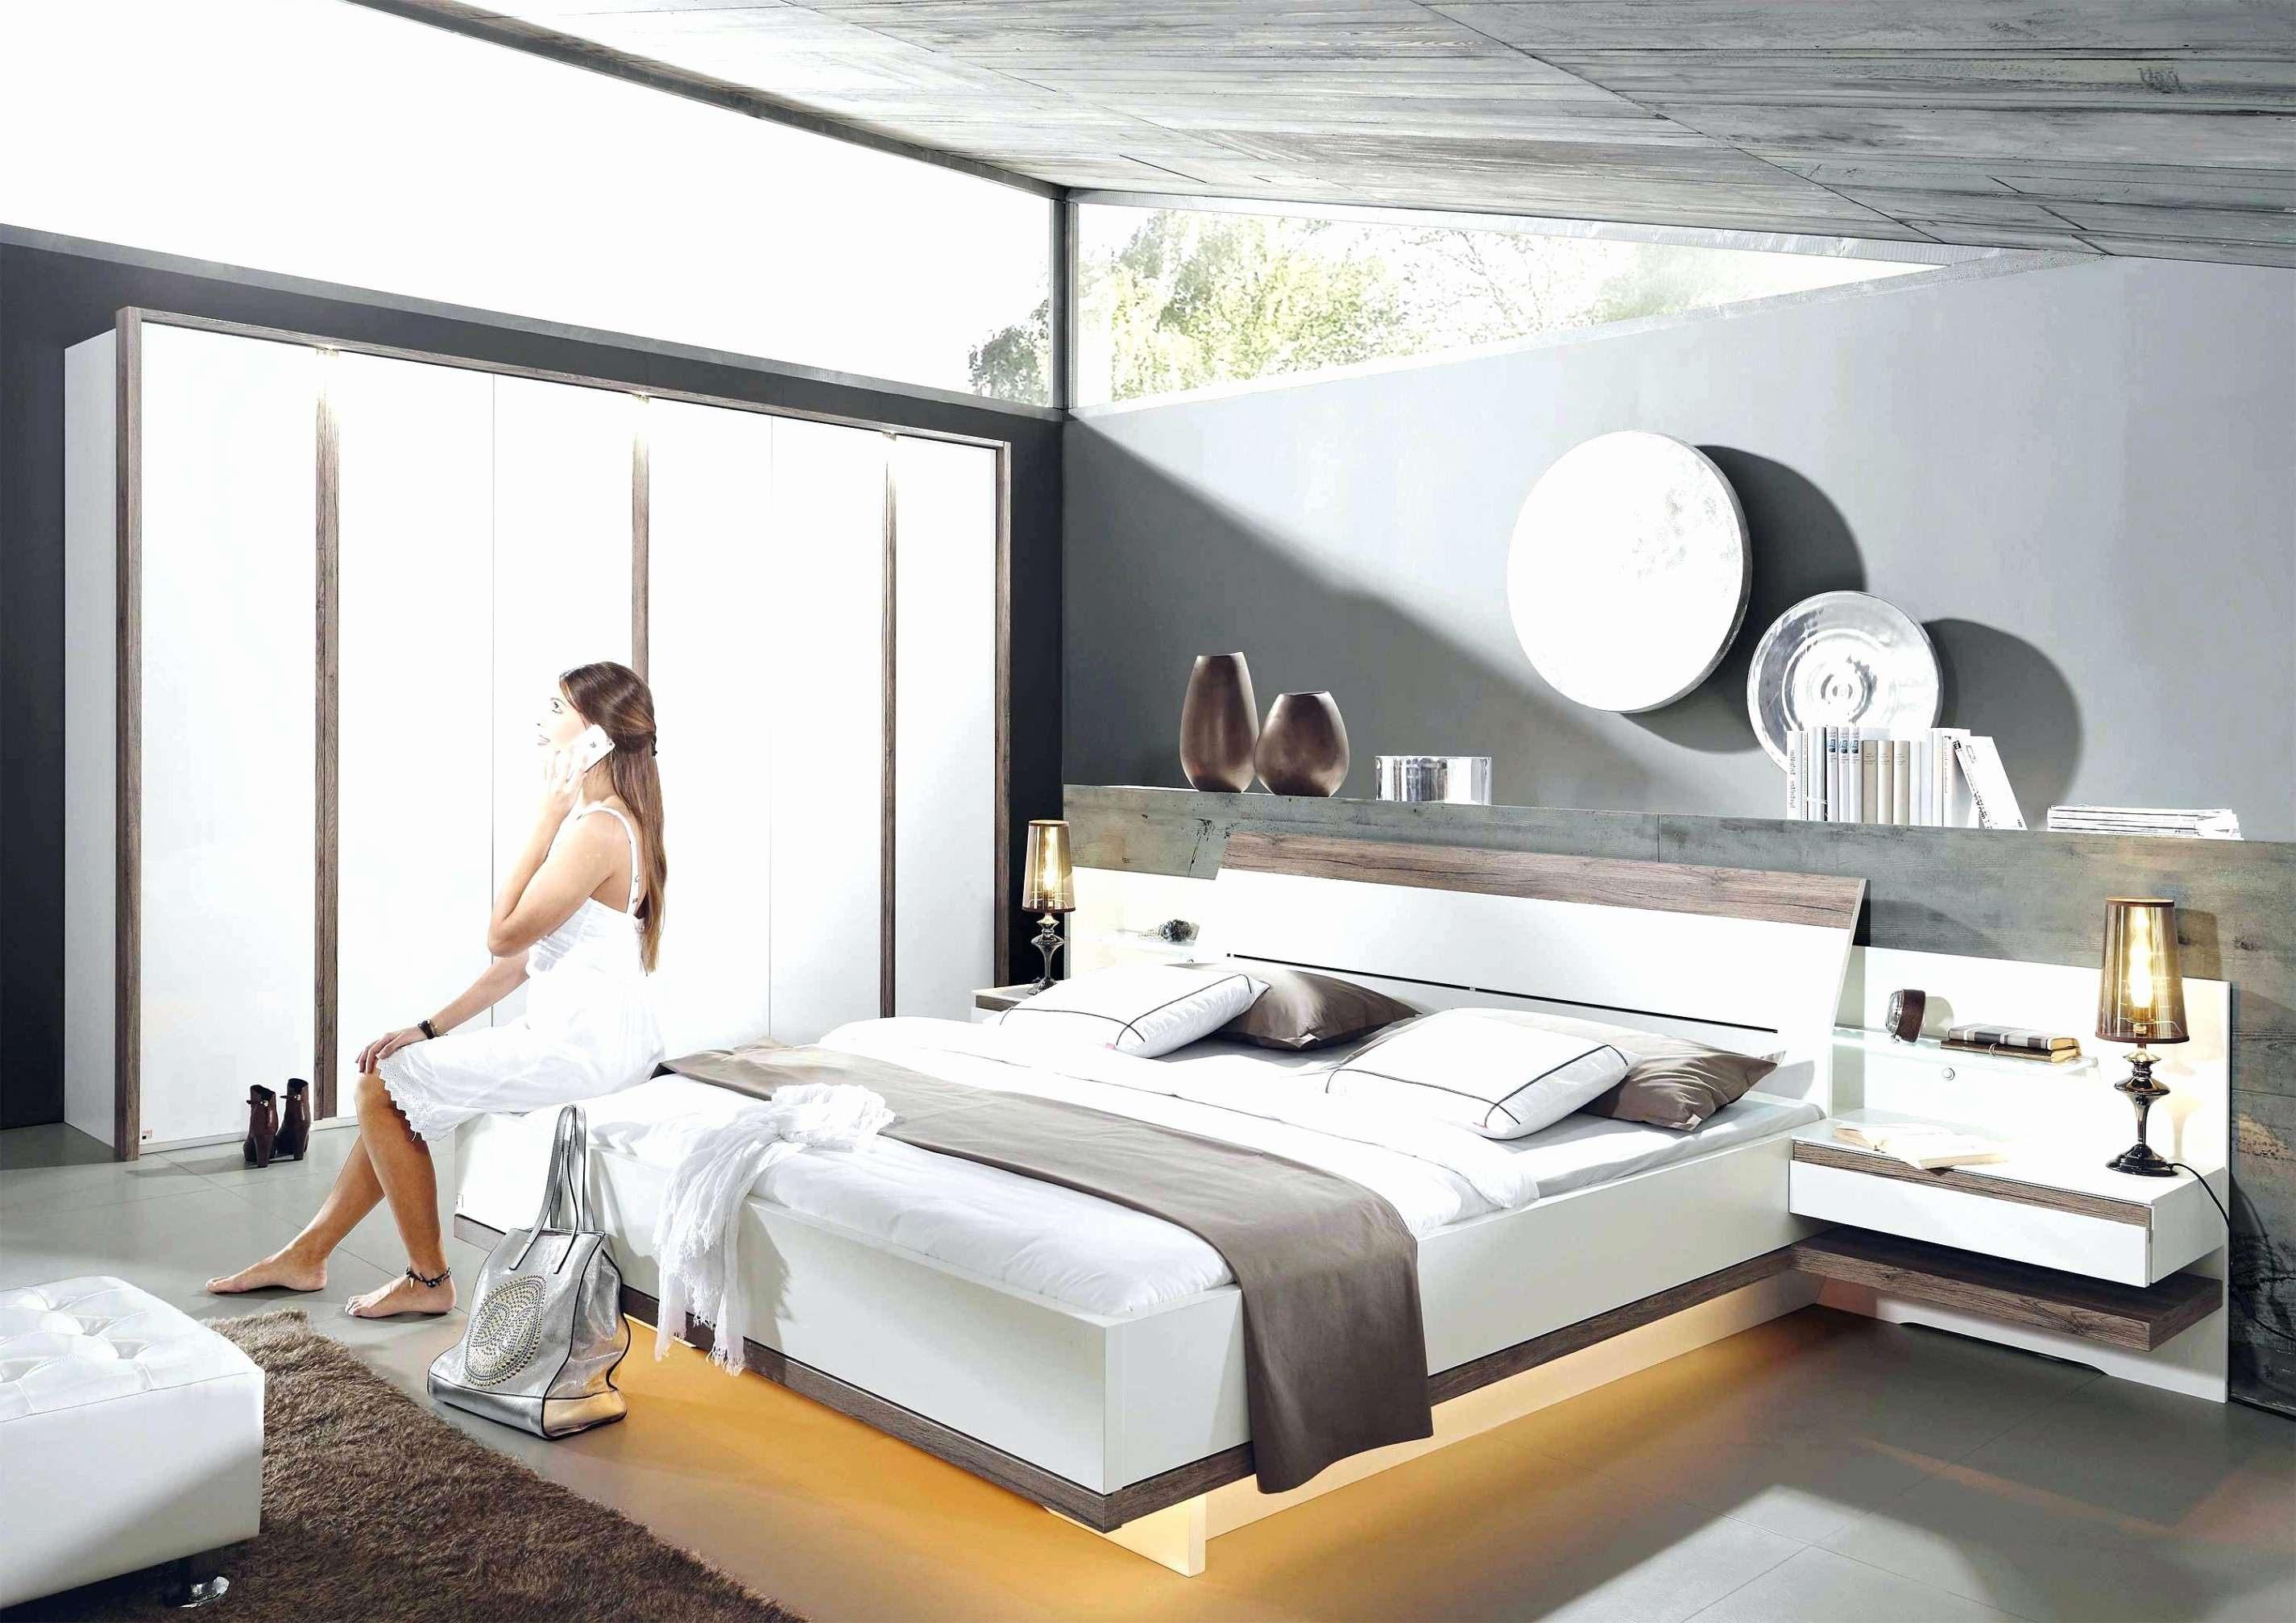 Linge De Lit 160x200 Le Luxe Lit En 160—200 Dekoration Kreativ Sympathisch Bettgestell Holz 140